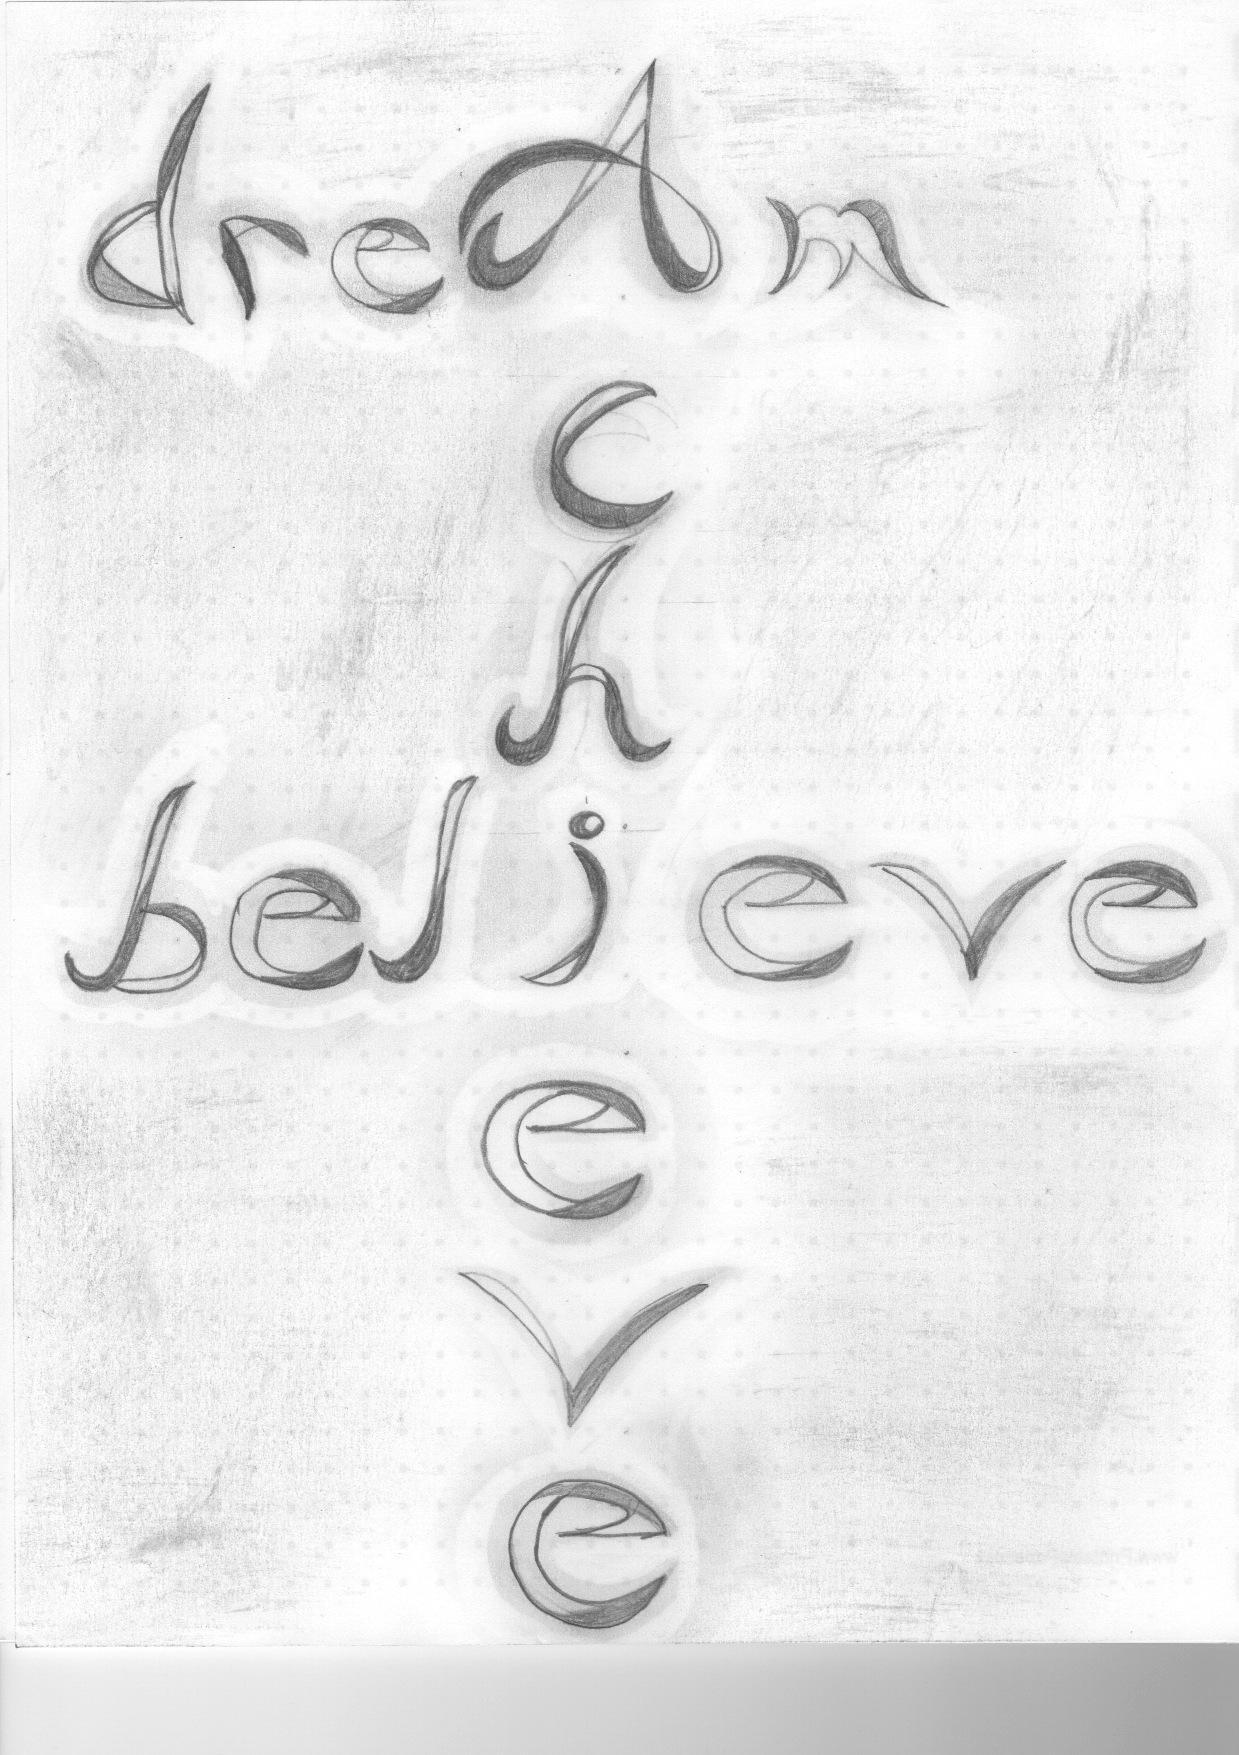 Dream.Believe.Achieve. - image 2 - student project